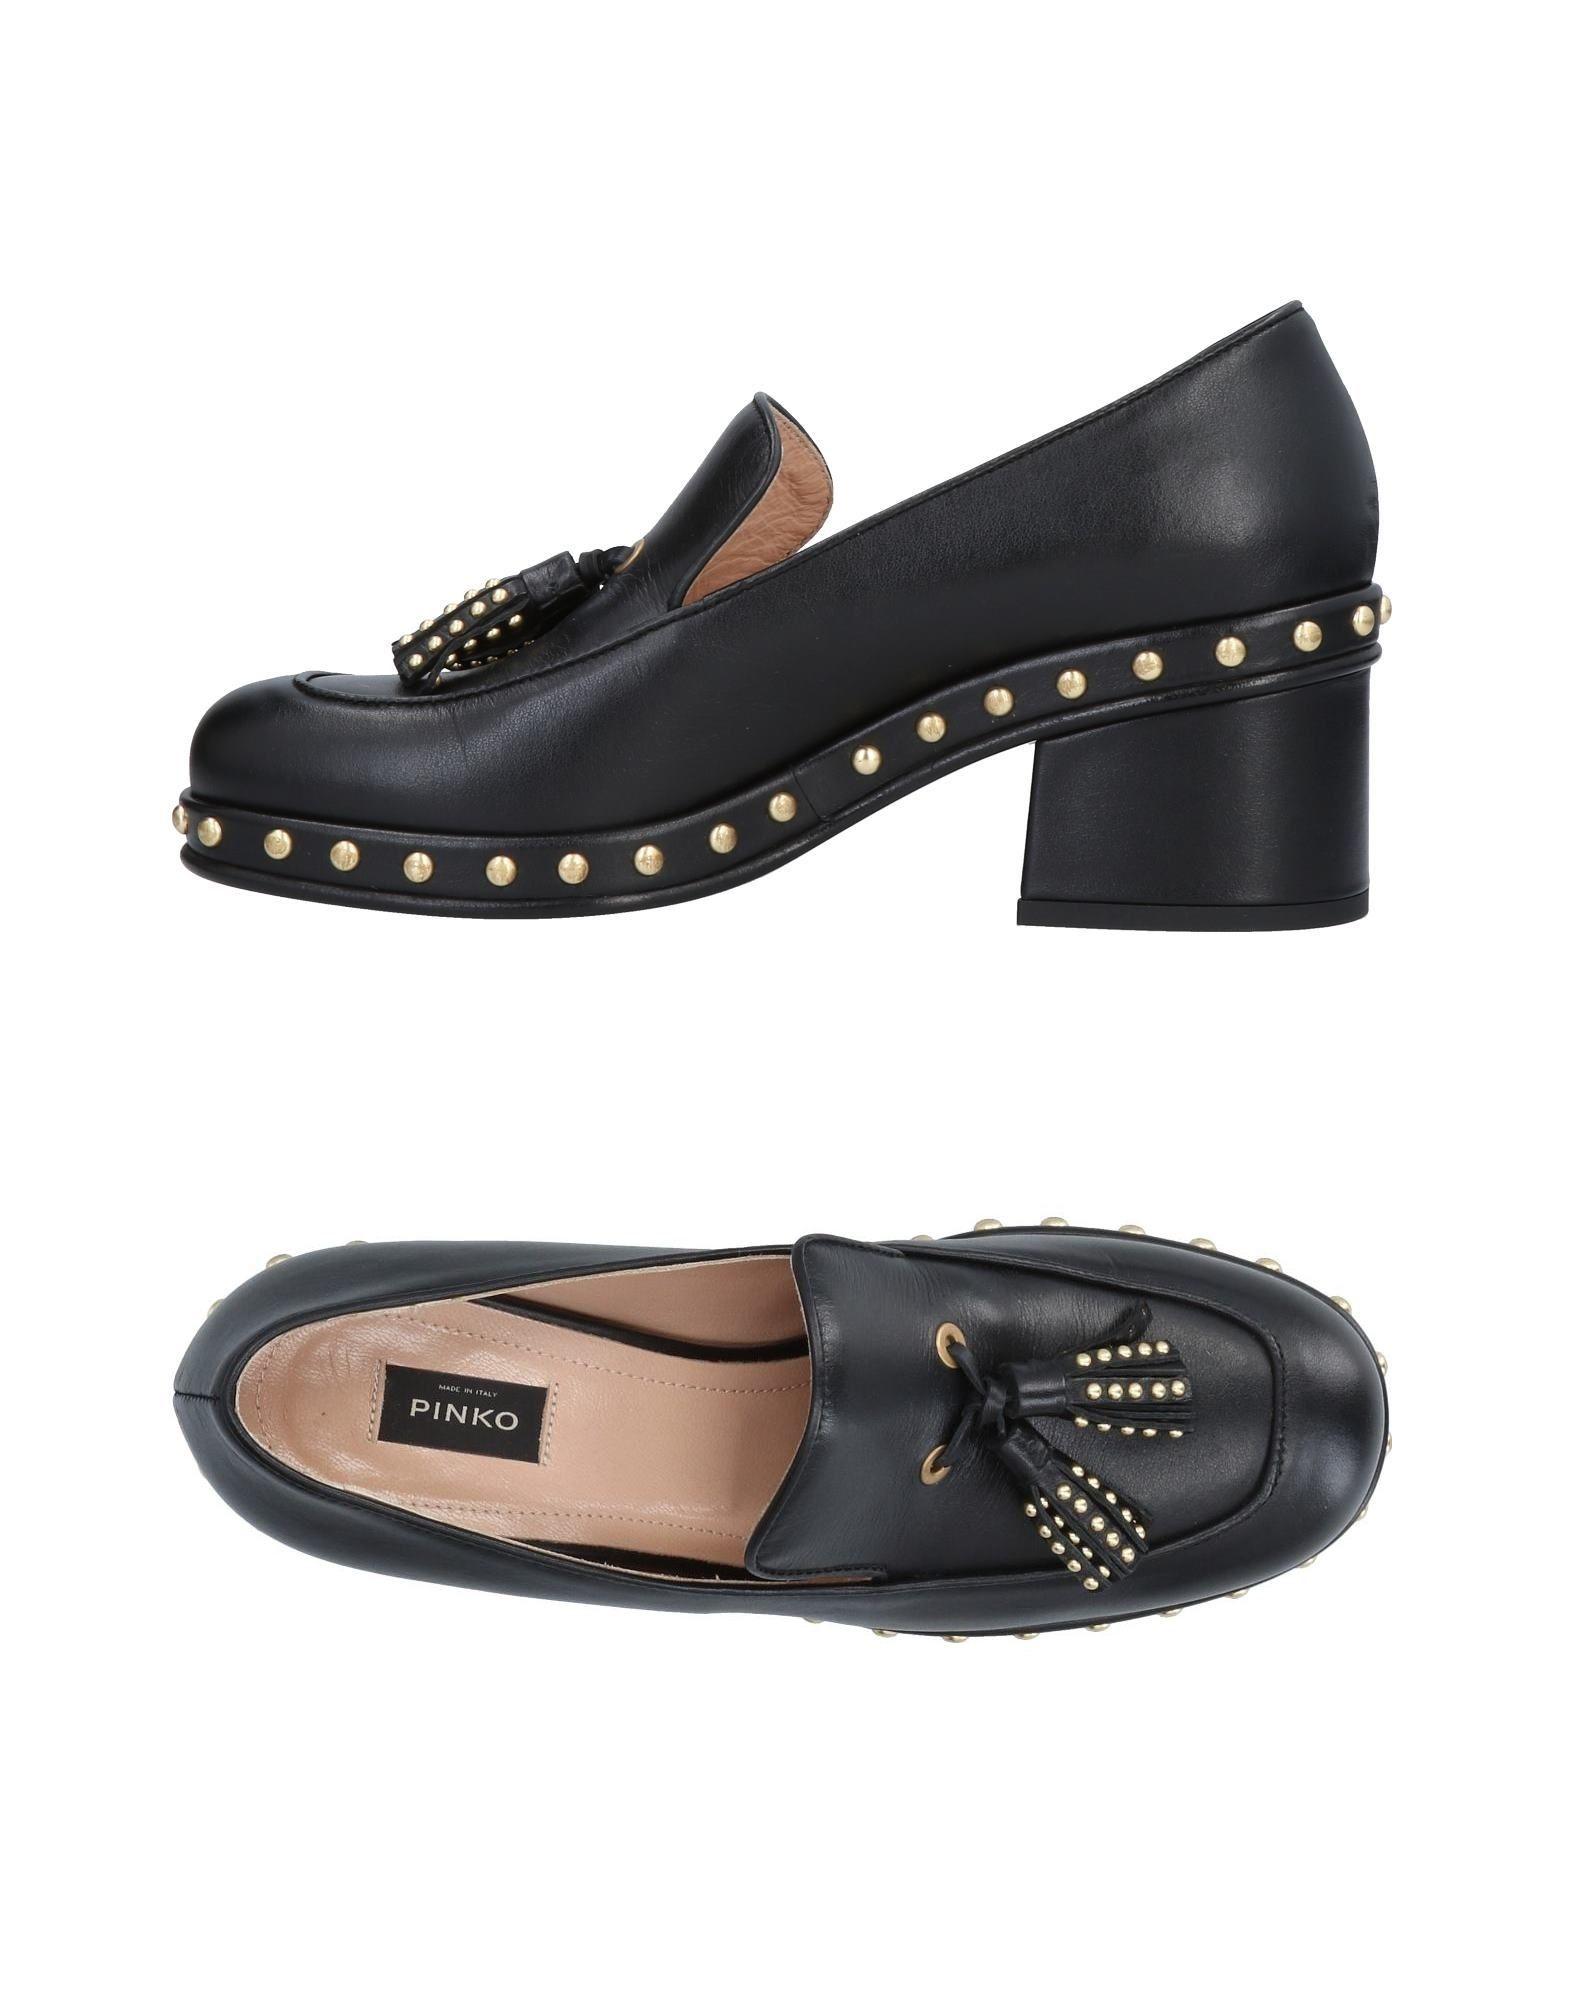 Moda Mocassino Pinko Donna - 11474505OW